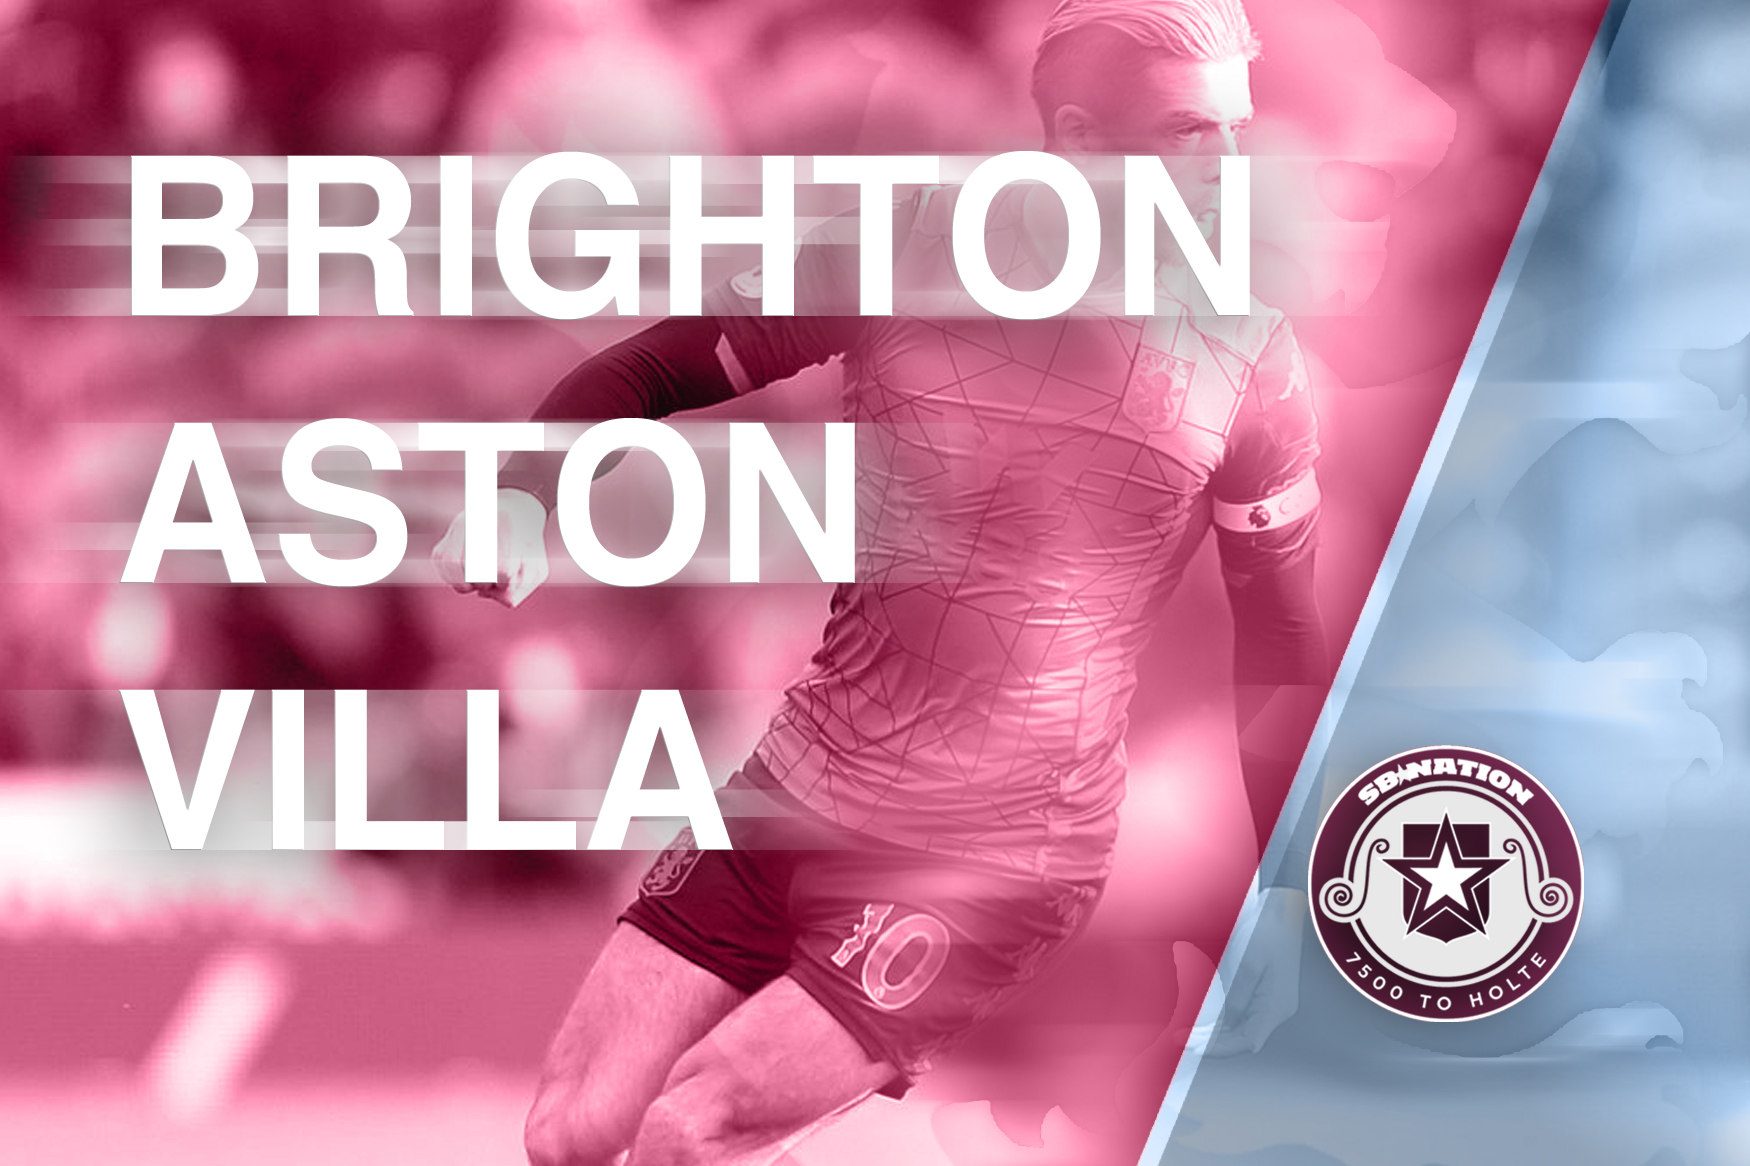 Aston Villa vs Brighton & Hove Albion: live stream info and how to watch Premier League online